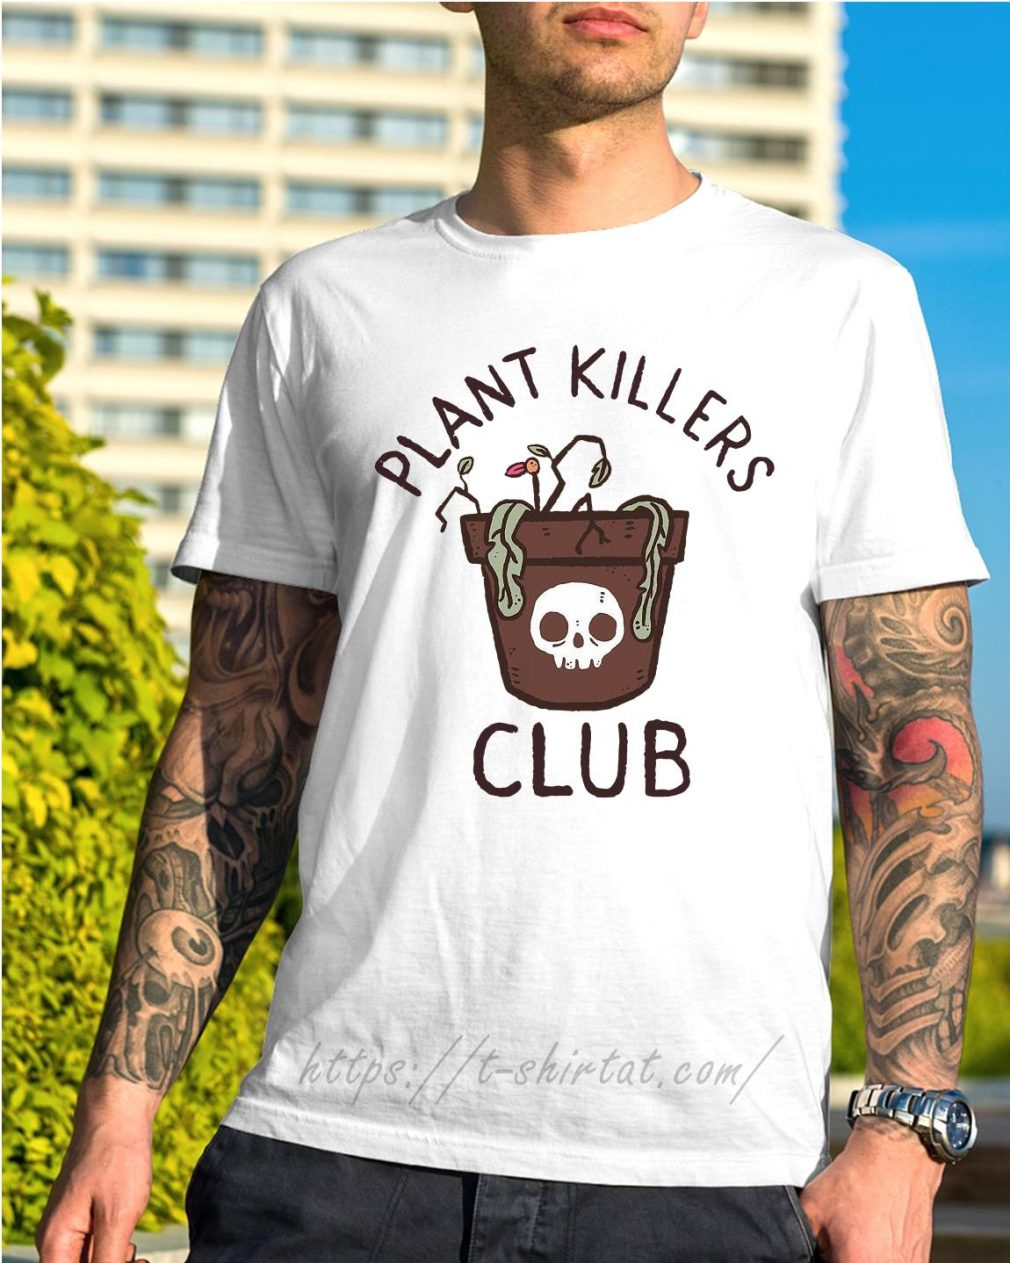 lxromero plant killers club shirt